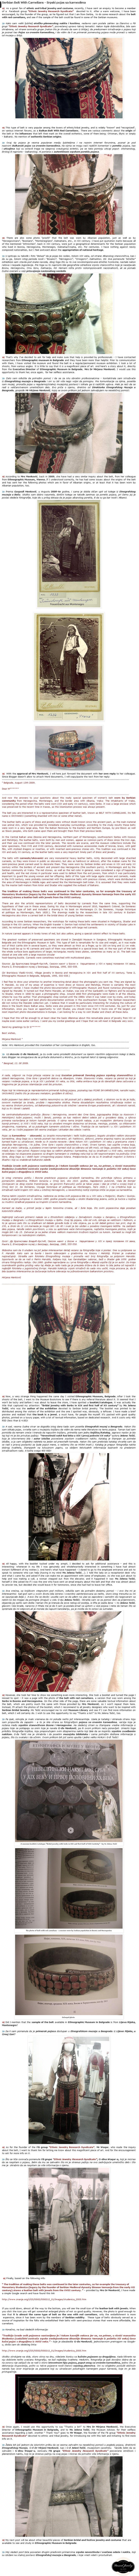 Serbian Belt With Carnelians - Srpski pojas sa karneolima. A wonderful article on the European origin of these belts.  http://mystarseed.blogspot.com/2015/08/serbian-belt-with-carnelians-srpski.html